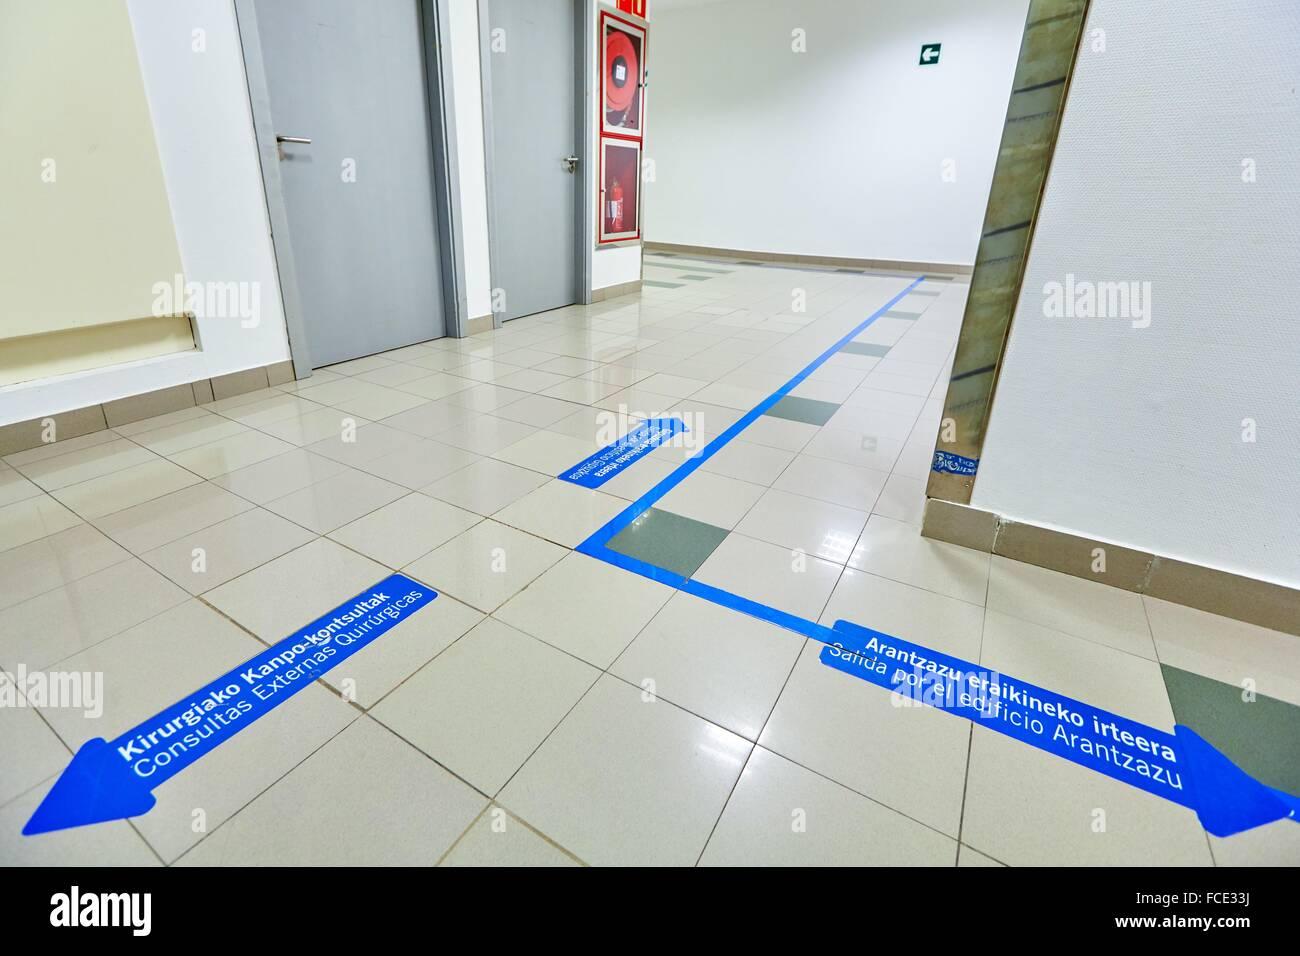 Corridors with signage, Ambulatory Surgery, Hospital Donostia, San Sebastian, Gipuzkoa, Basque Country, Spain - Stock Image